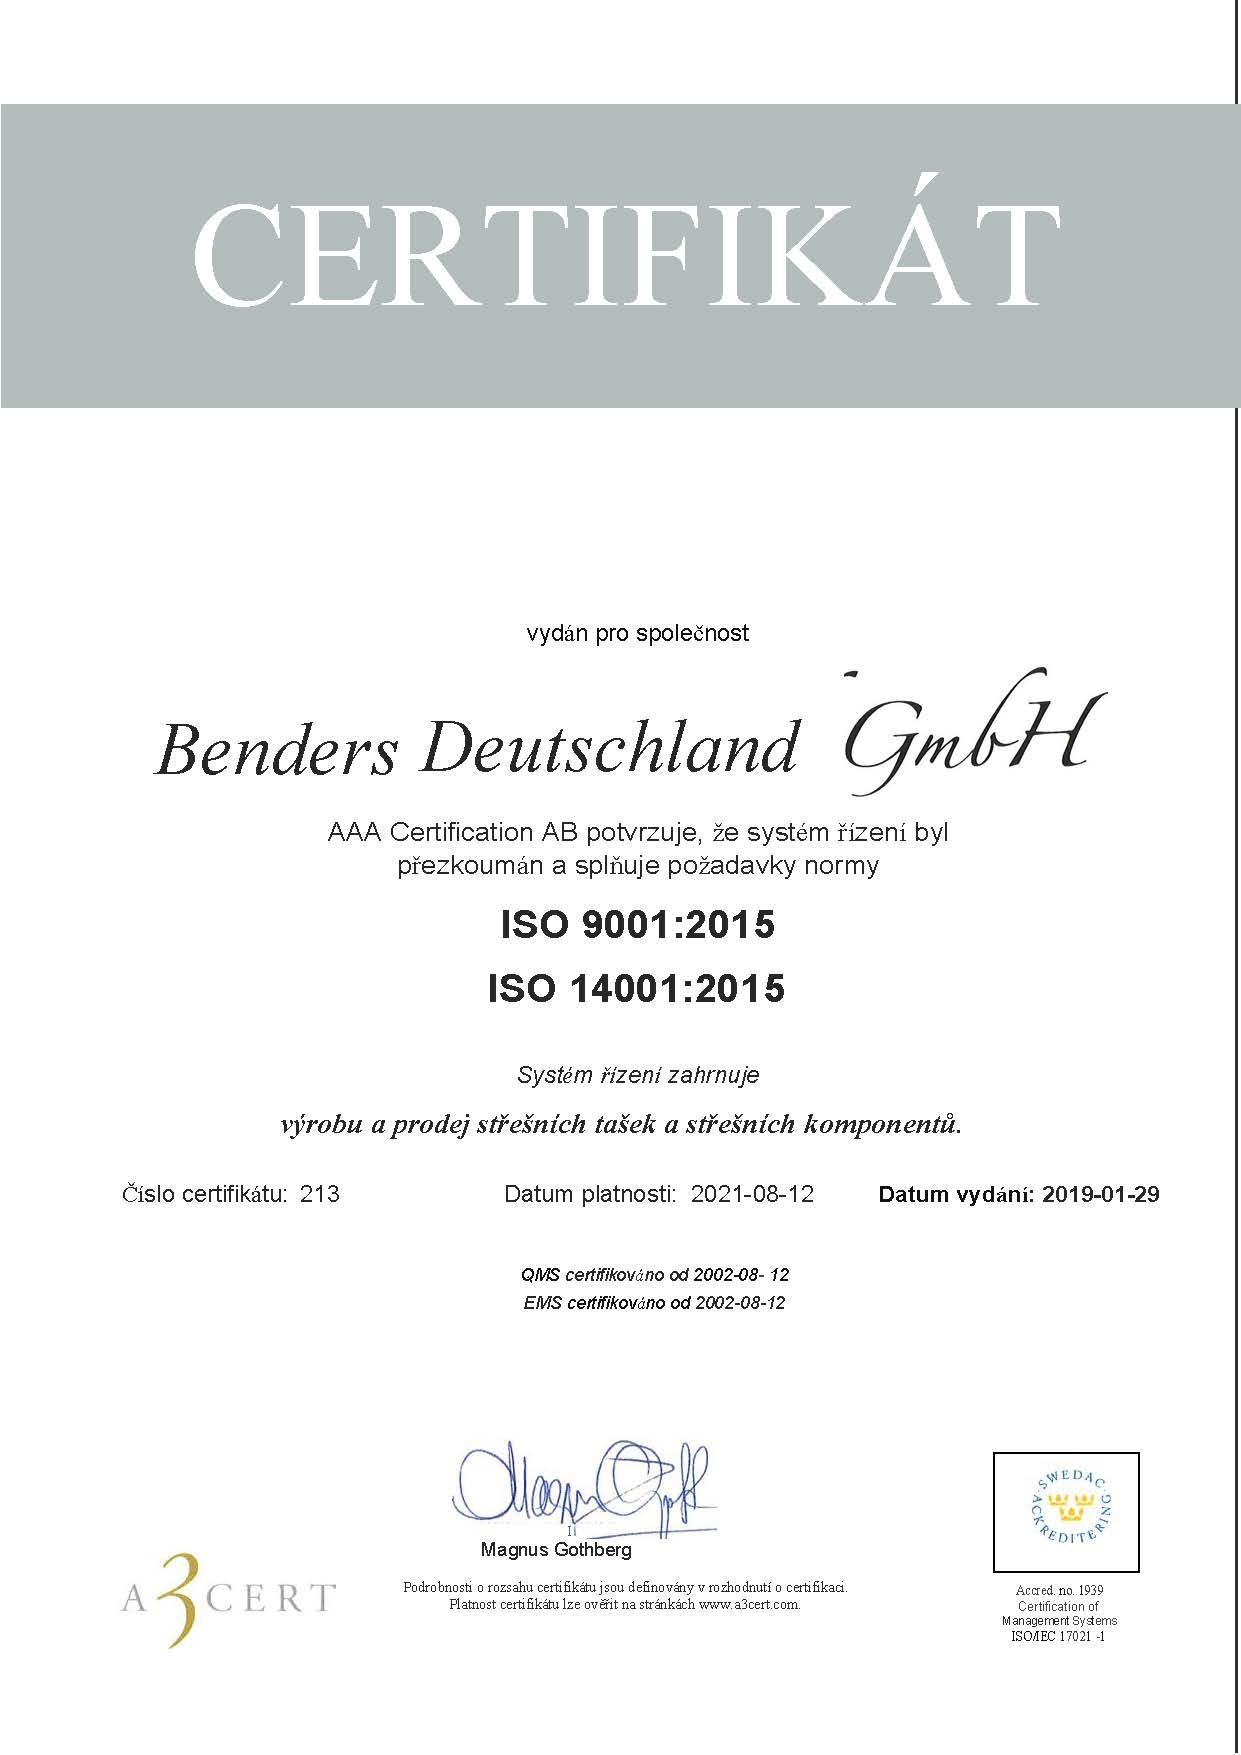 ISO Certifikat 20190129